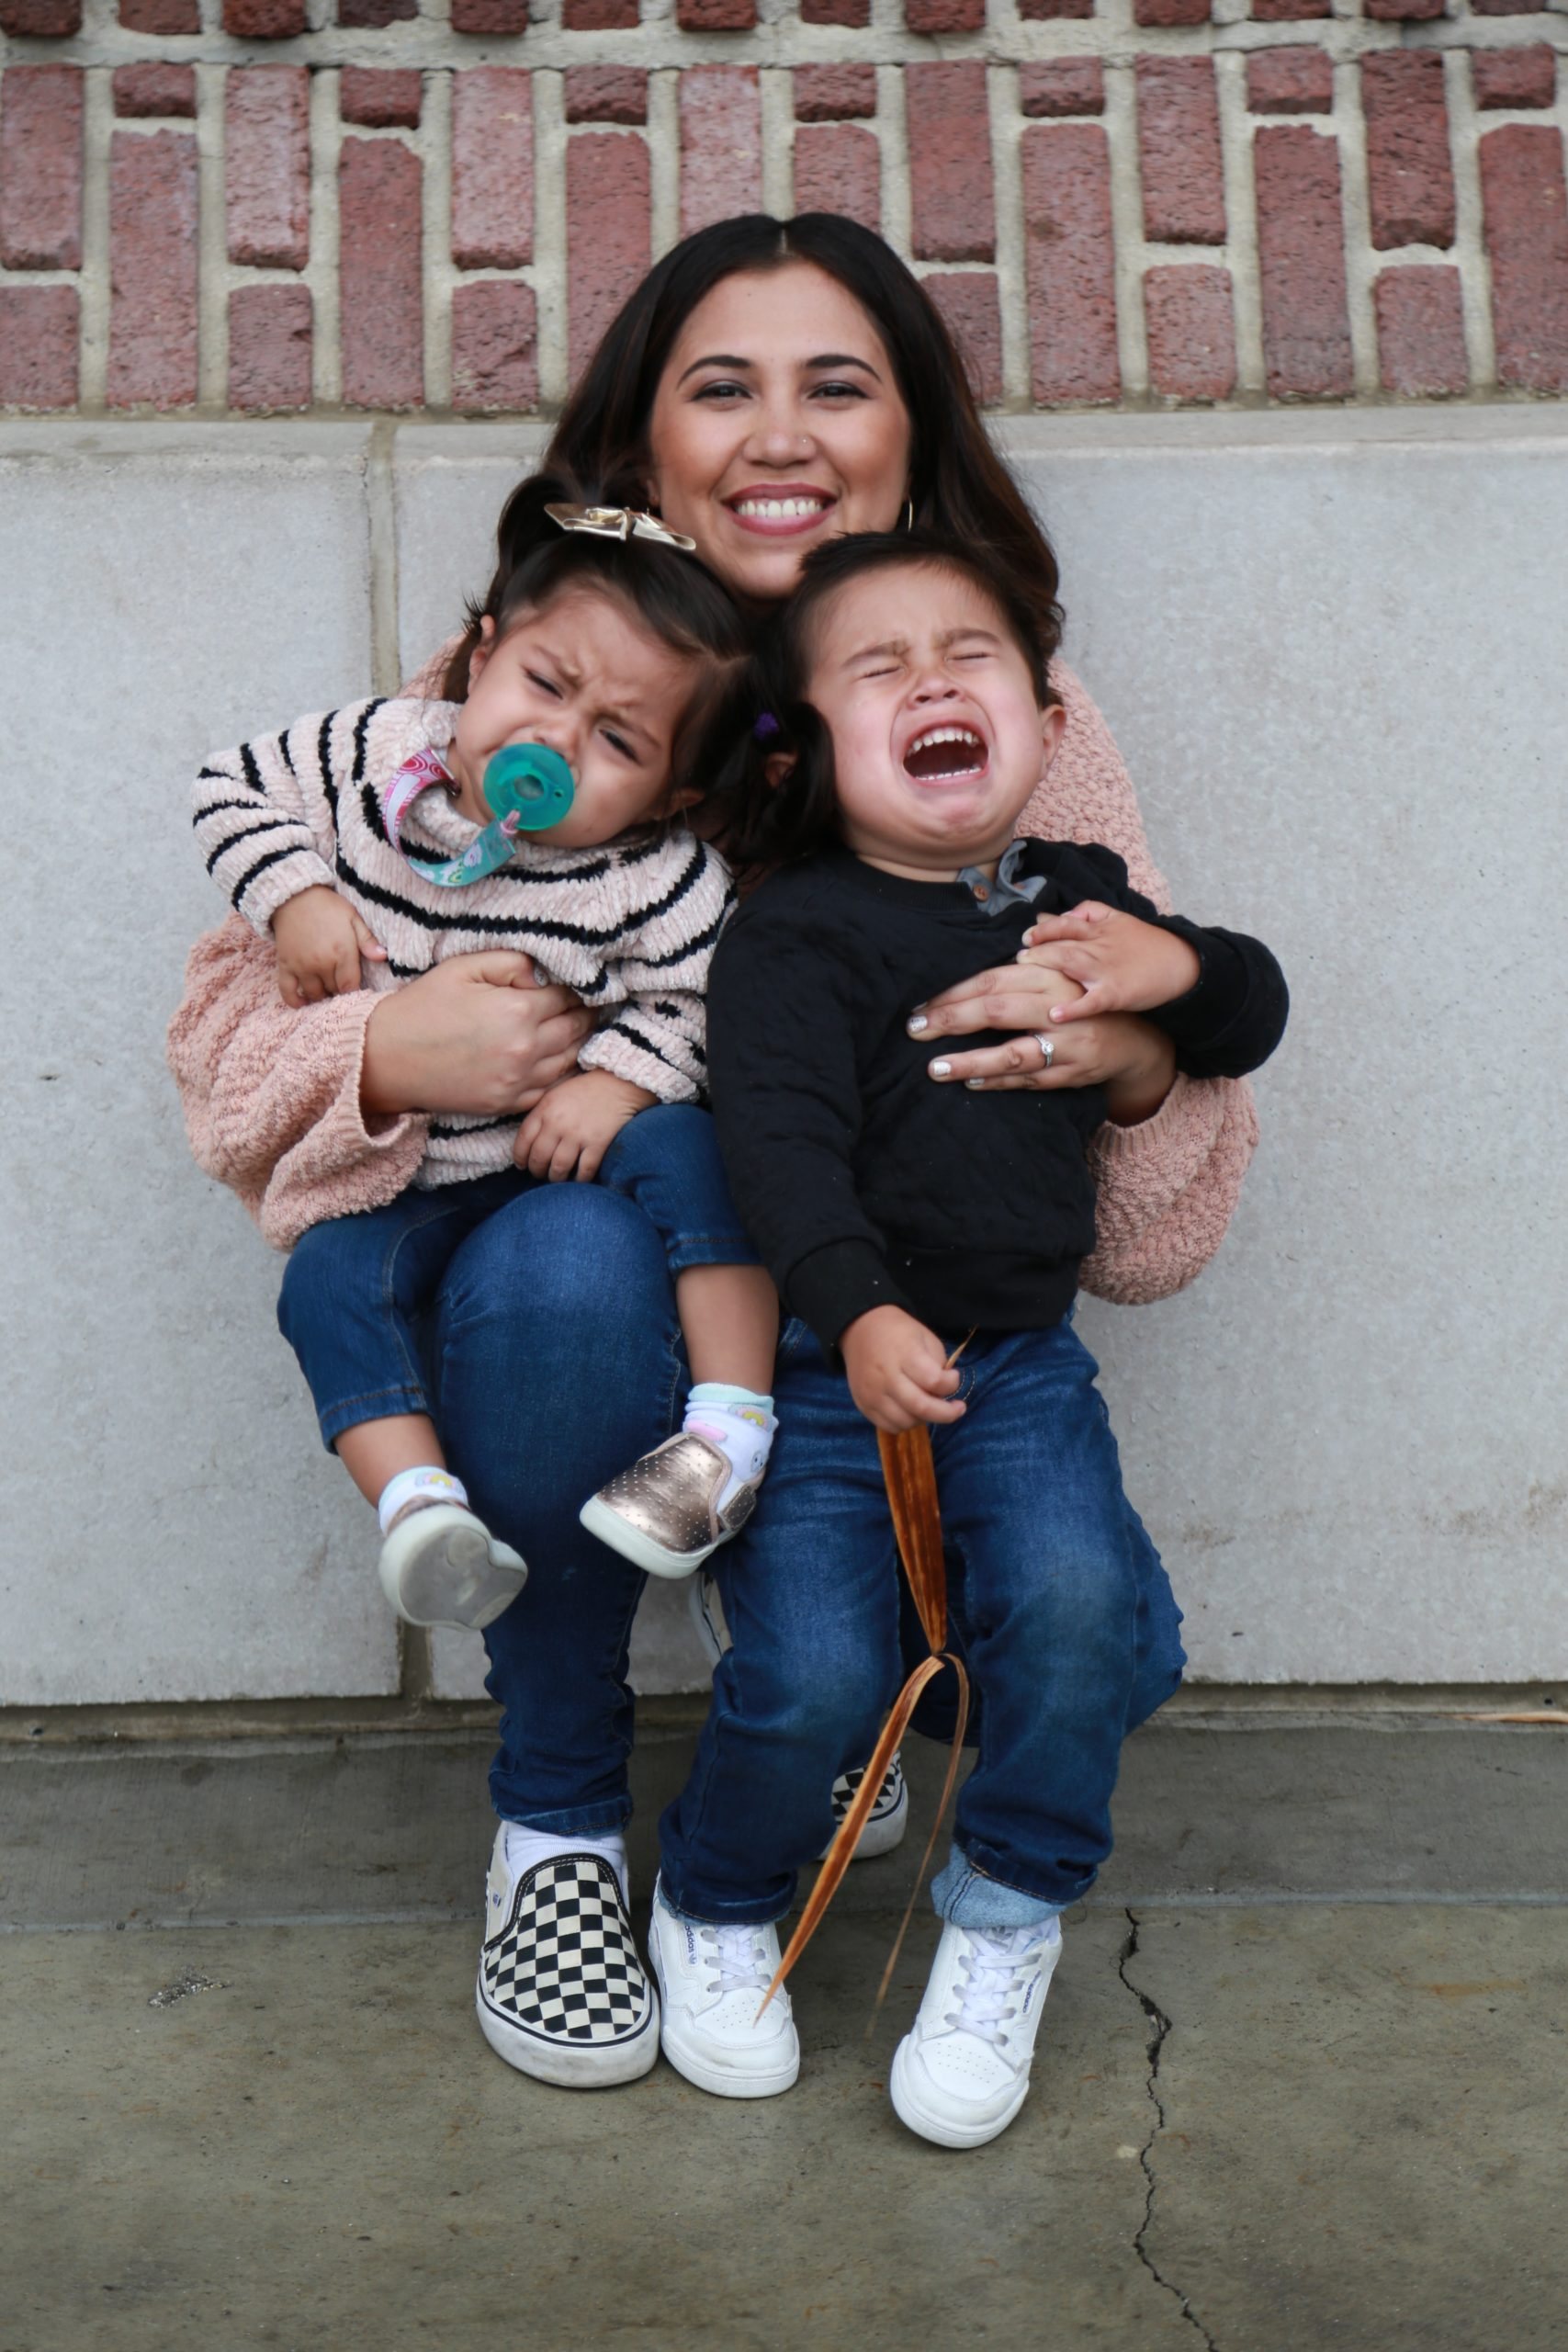 mother hugging toddlers throwing a tantrum